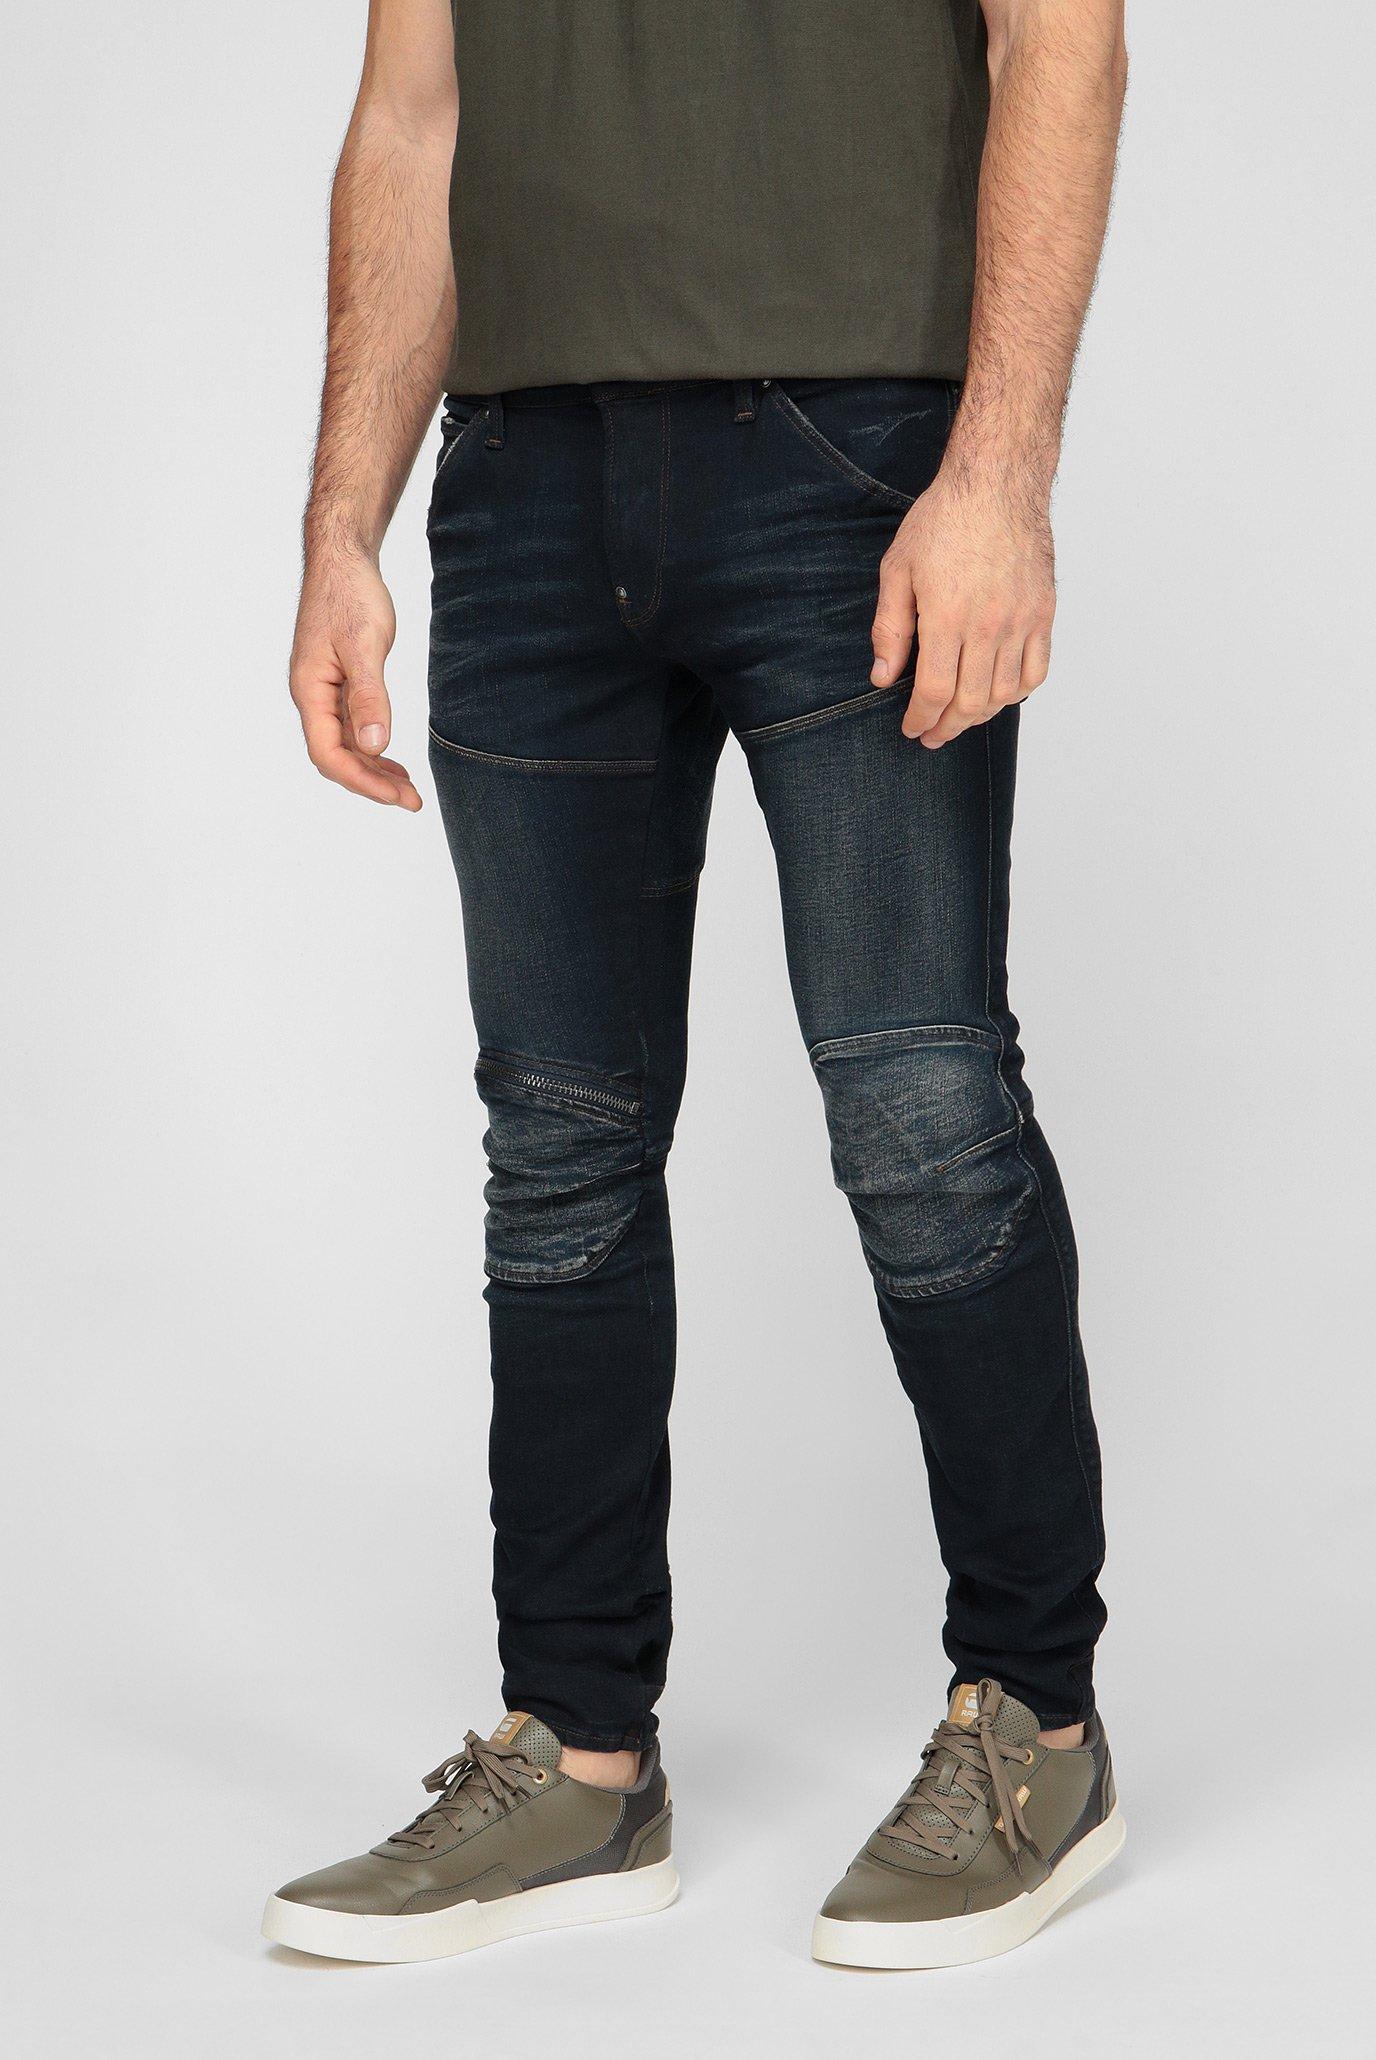 Мужские темно-синие джинсы Zip Knee Skinny G-Star RAW